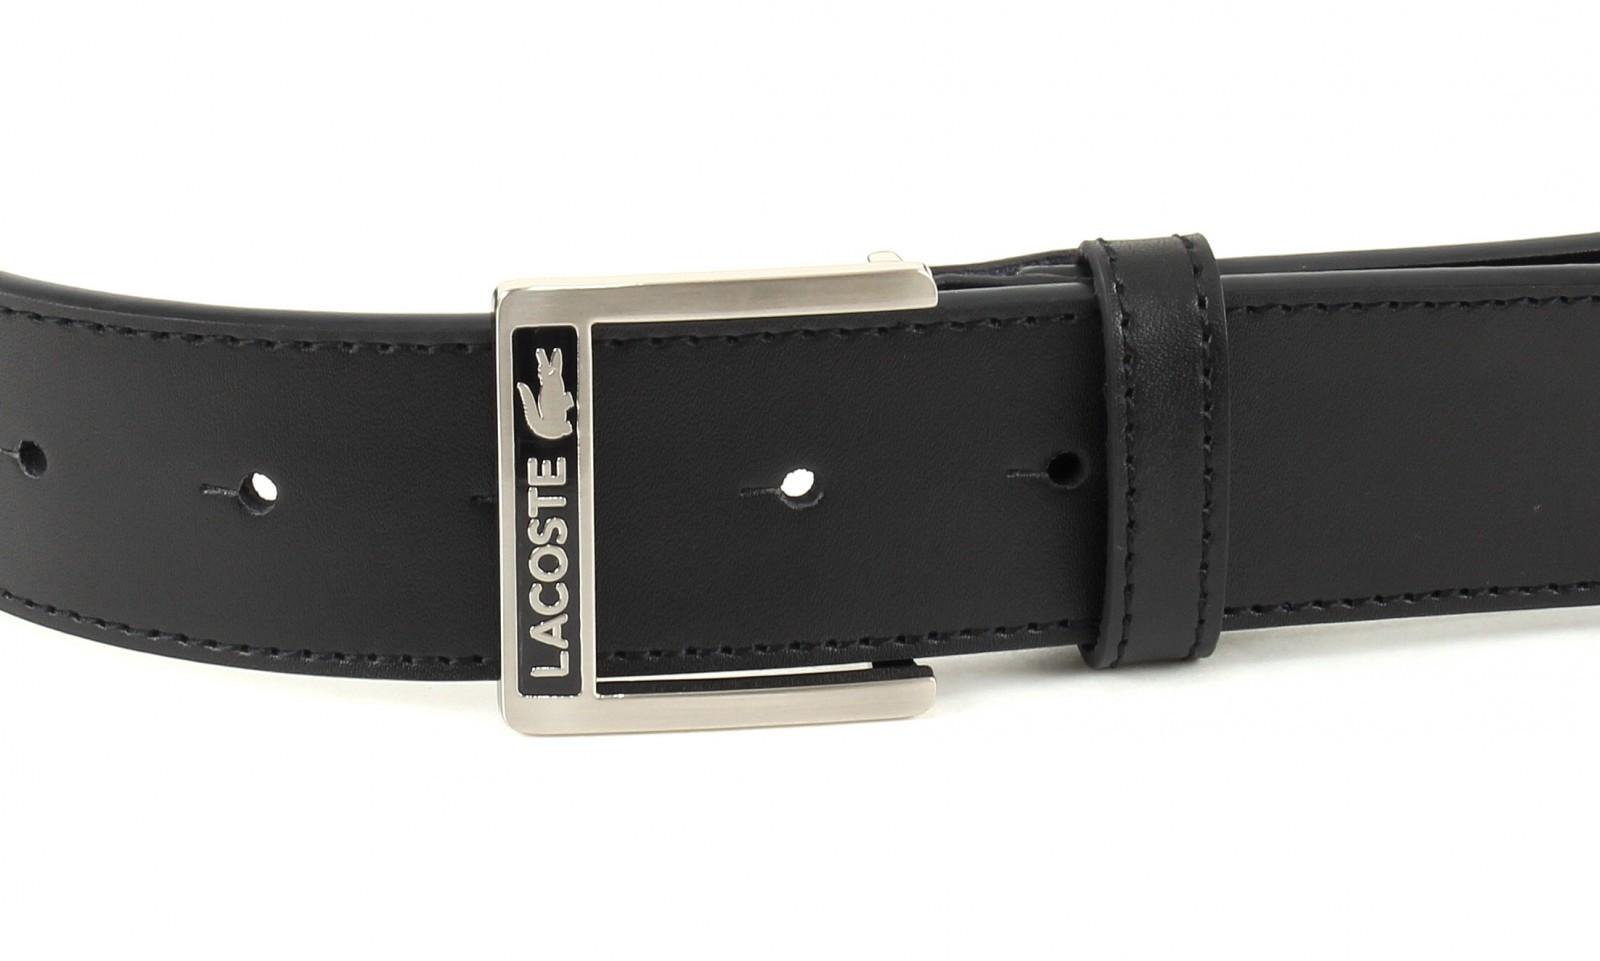 ad02c379a02b LACOSTE Belt Reversible Welded Edges W110 Black